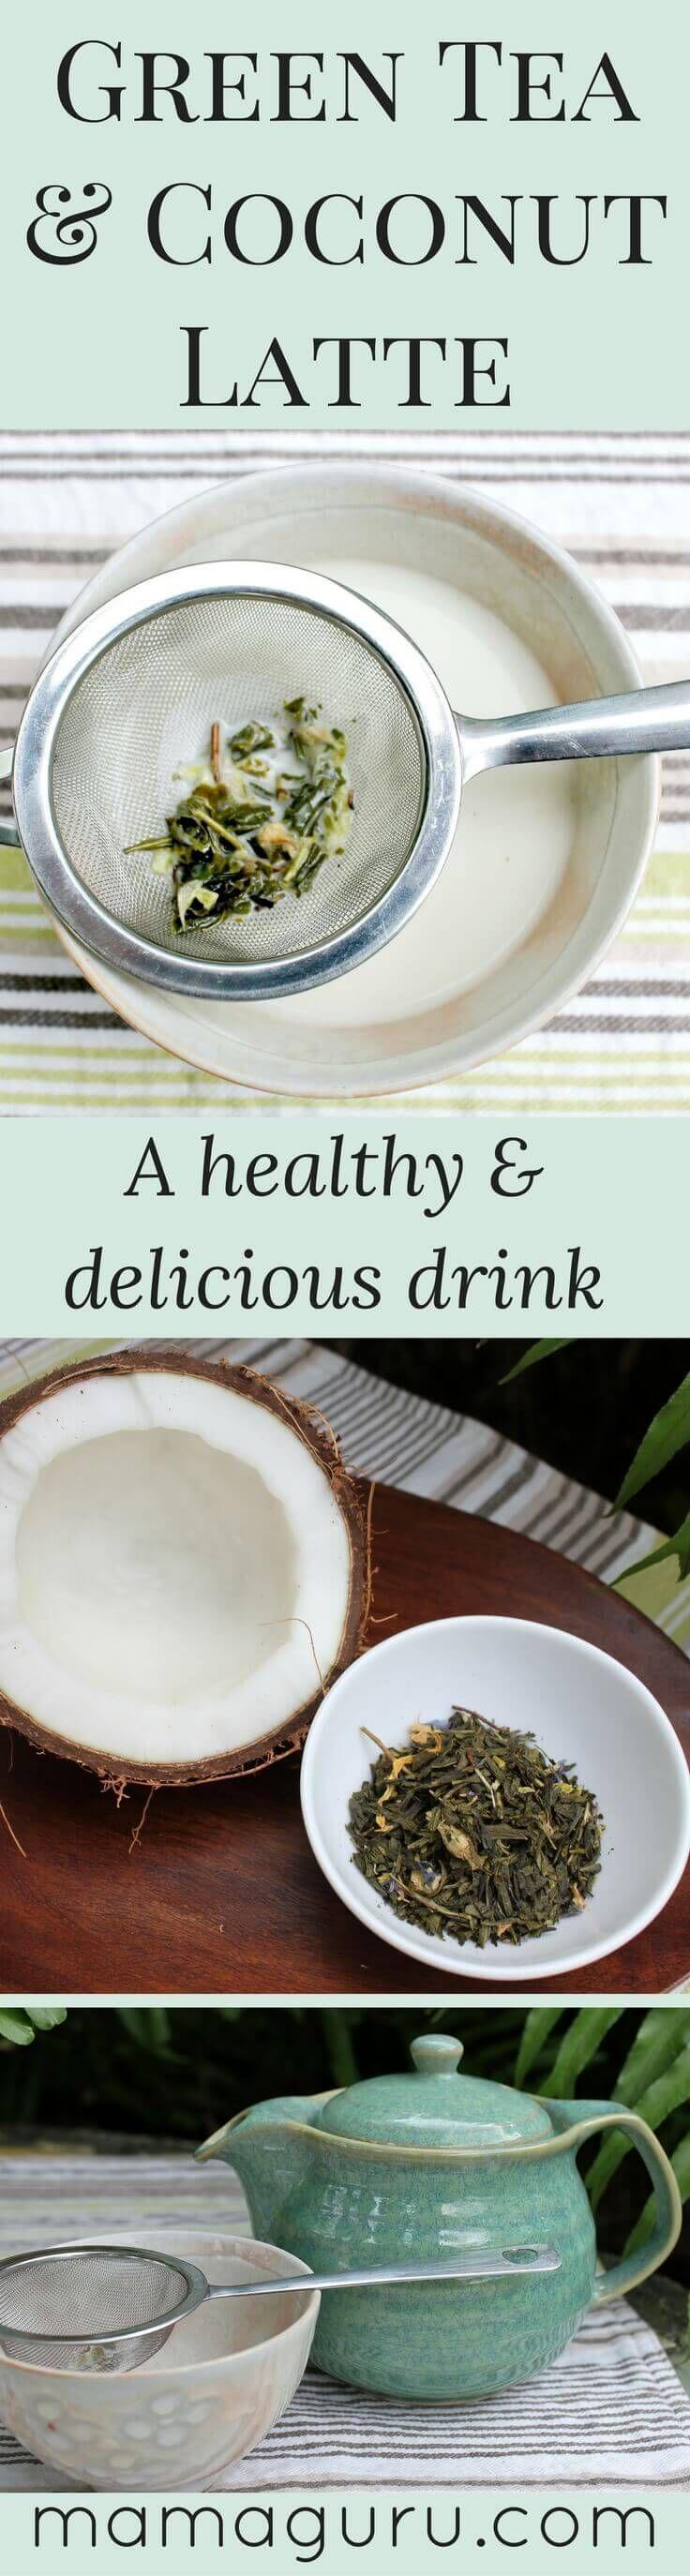 Green Tea | Coconut Milk Recipe | Vegan Recipe | Detox Recipe | Matcha Recipe